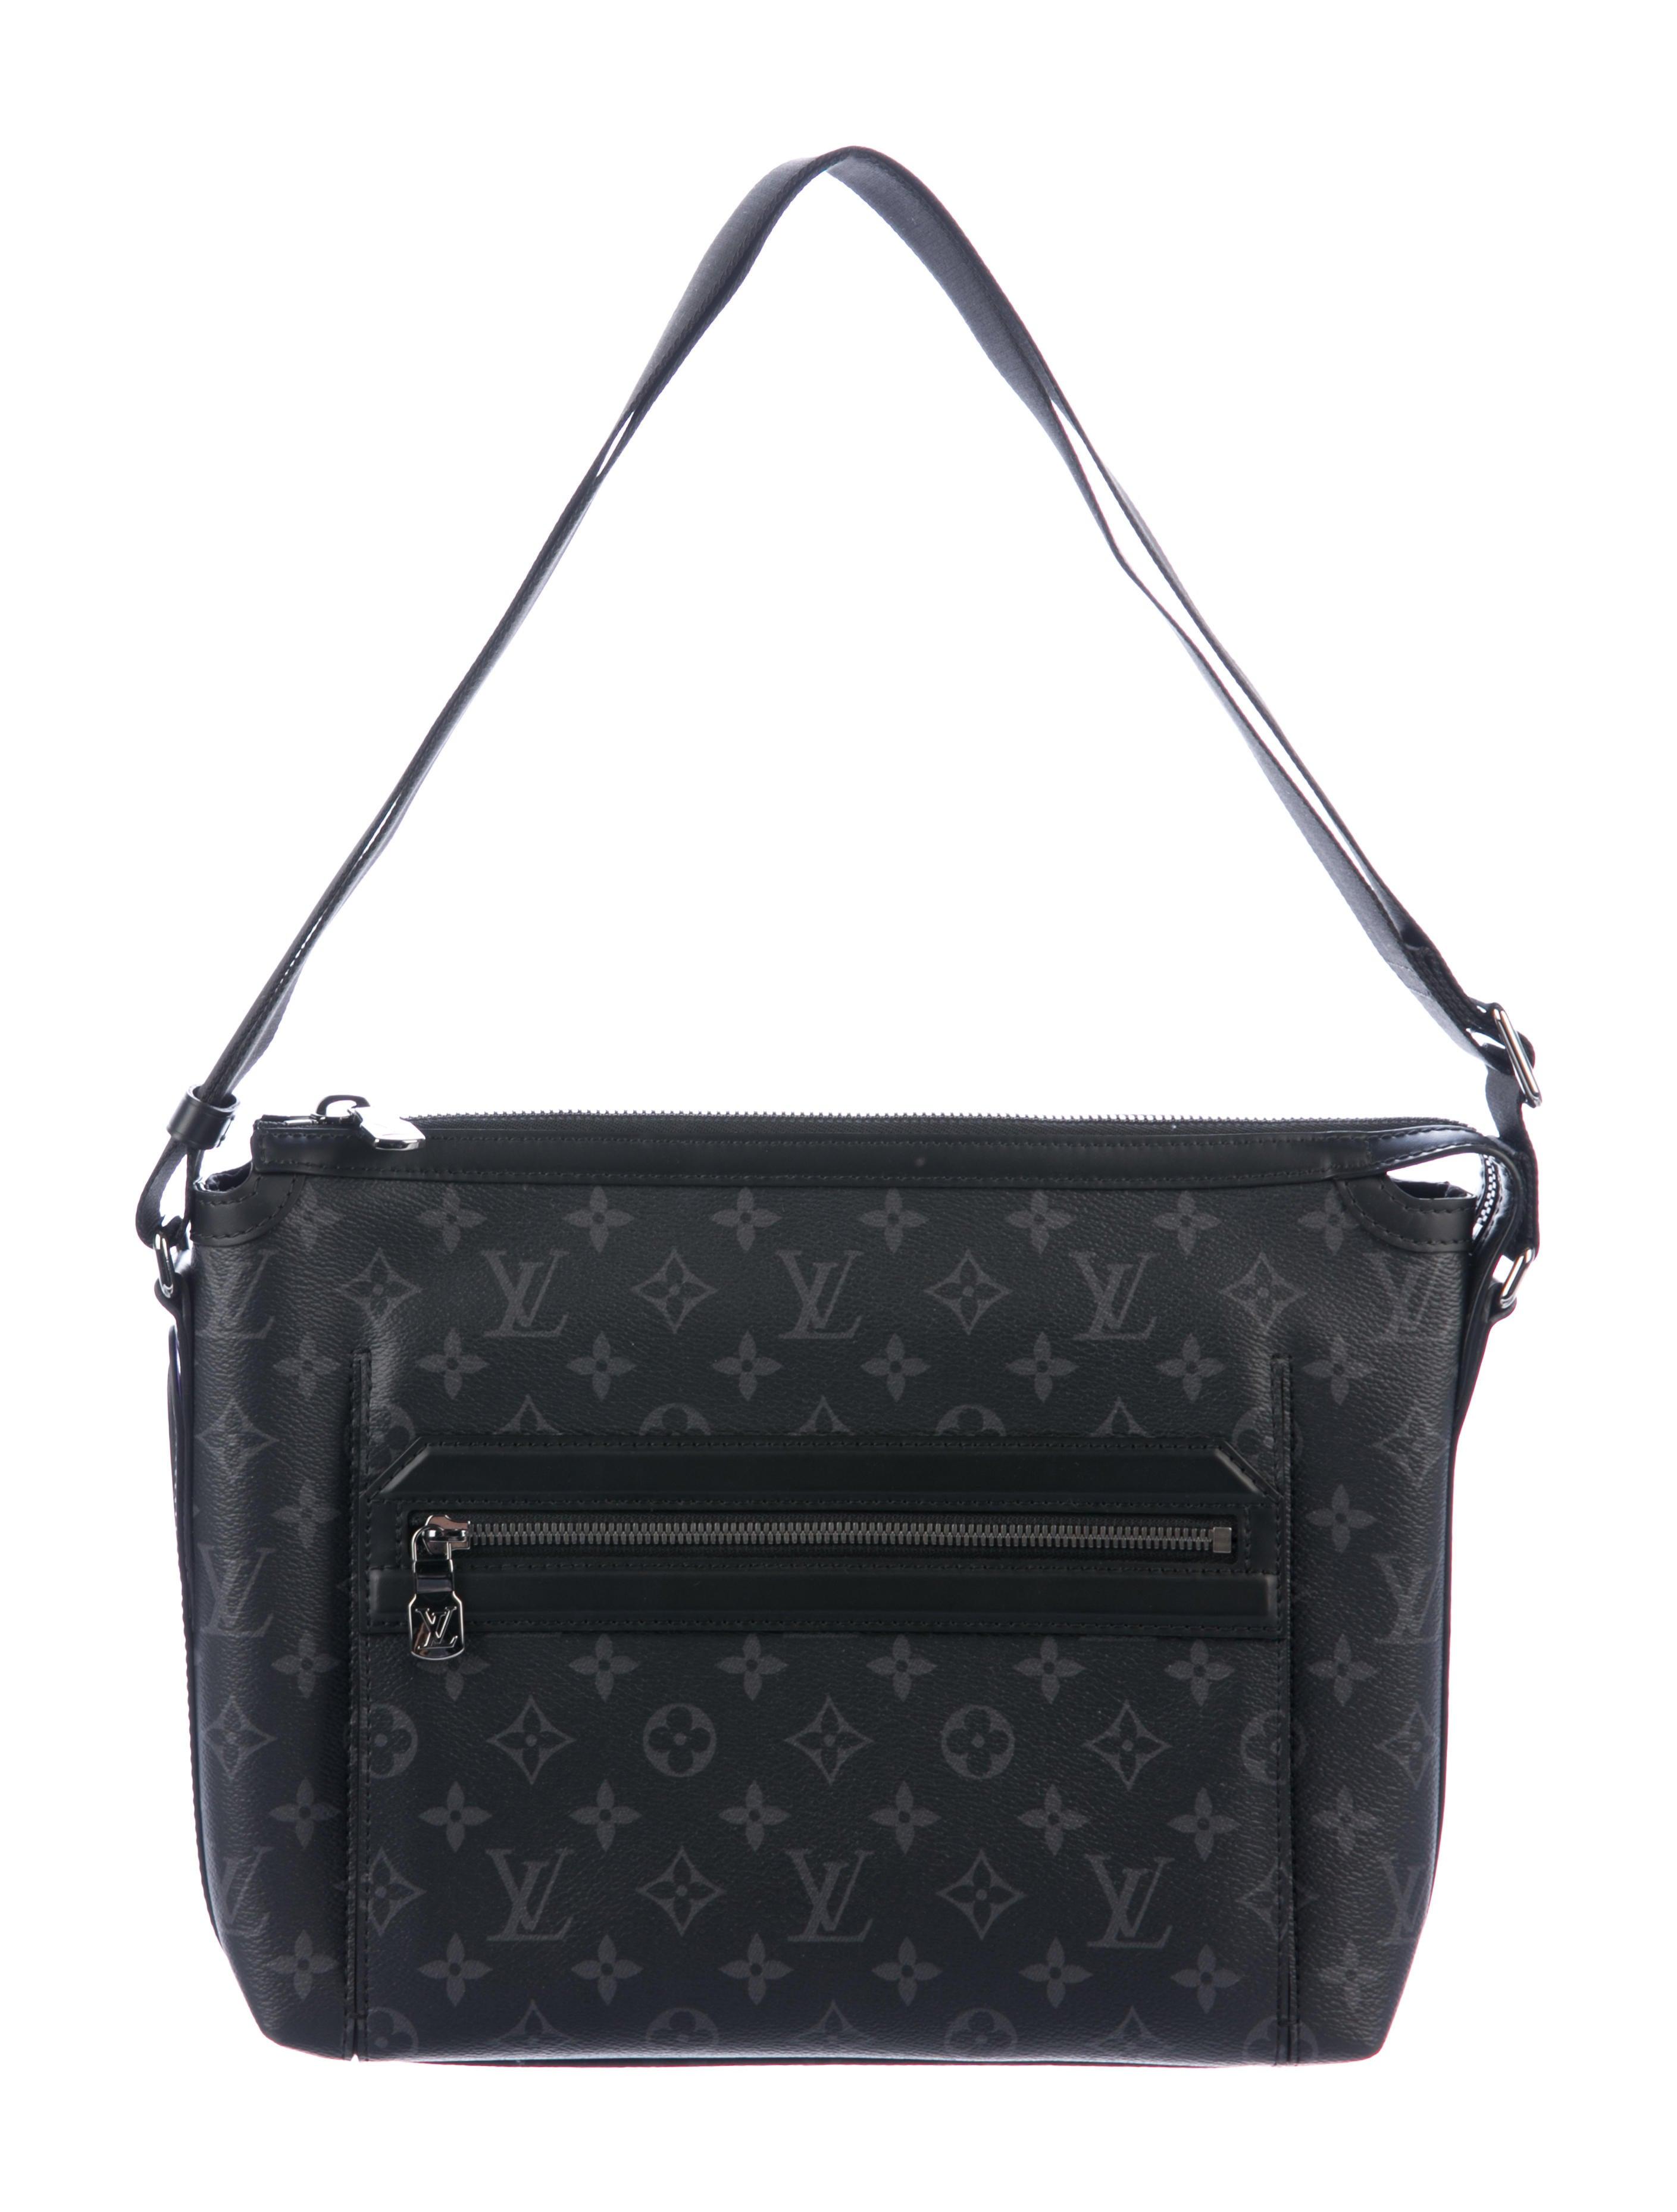 e30749a2ab82 Louis Vuitton 2018 Monogram Eclipse Odyssey Messenger PM - Bags ...